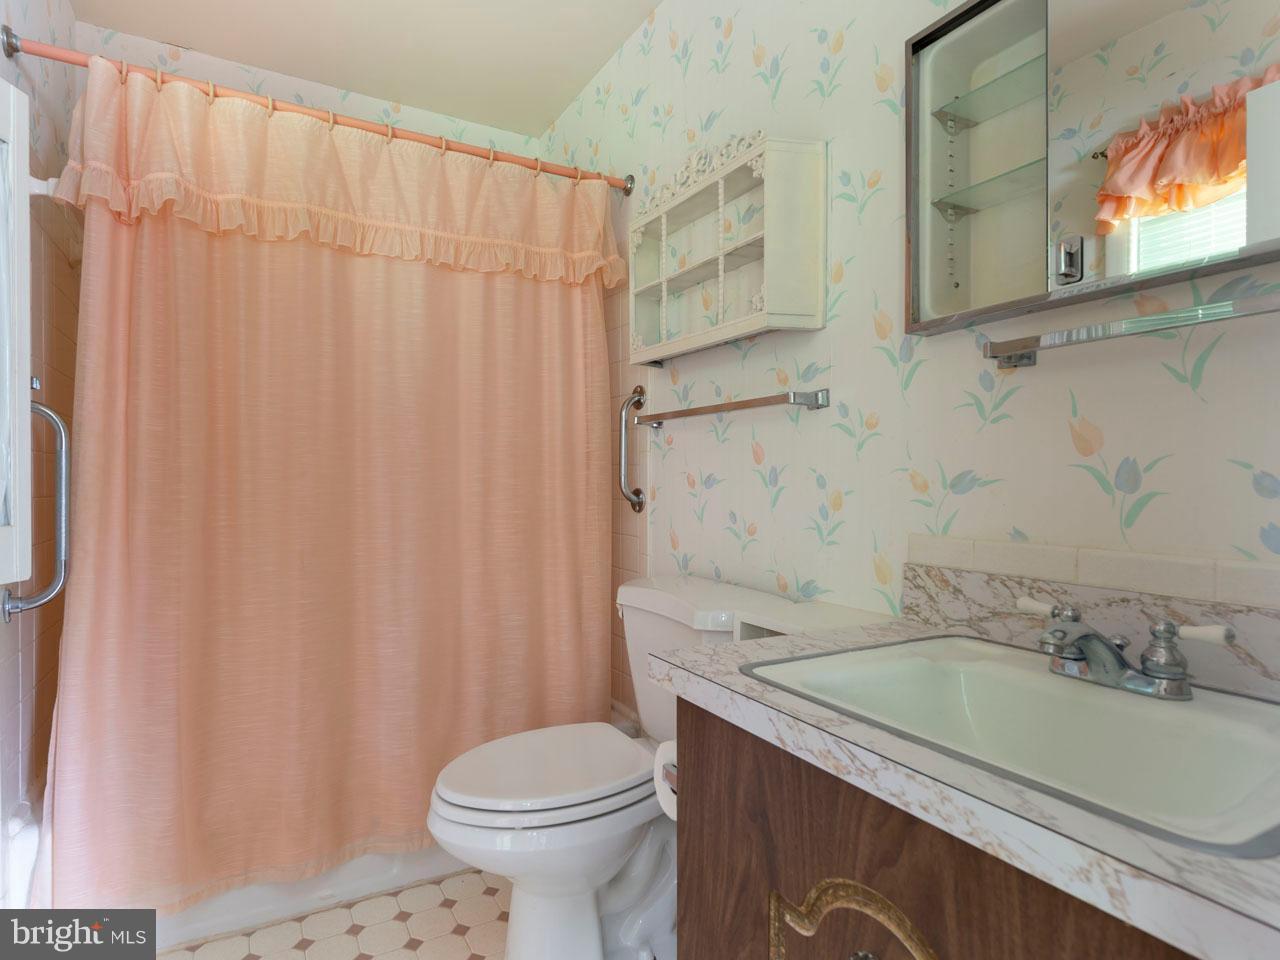 VAFX300106-301103781233-2021-09-05-14-14-30  |   | Alexandria Delaware Real Estate For Sale | MLS# Vafx300106  - Best of Northern Virginia